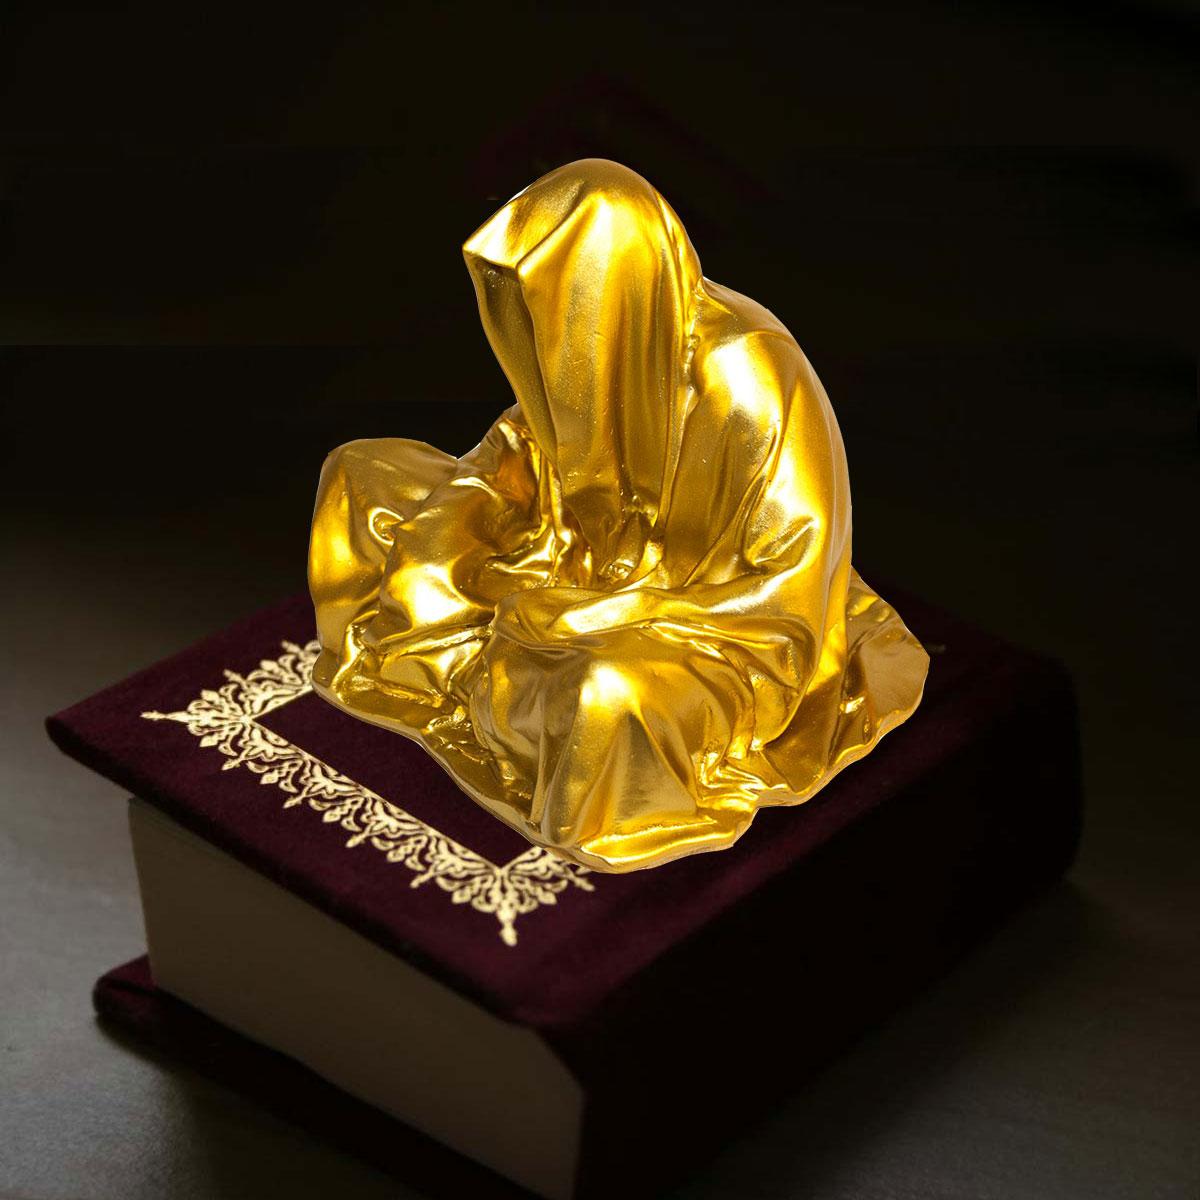 book-quran-guardian-by-manfred-kili-kielnhofer-concept-2011-contemporary-art-sculpture-ghost-thed-death-faceless-shroud-coat-cloak-statue-religion-biennial-art-fair-design-show-museum-gallery--0465